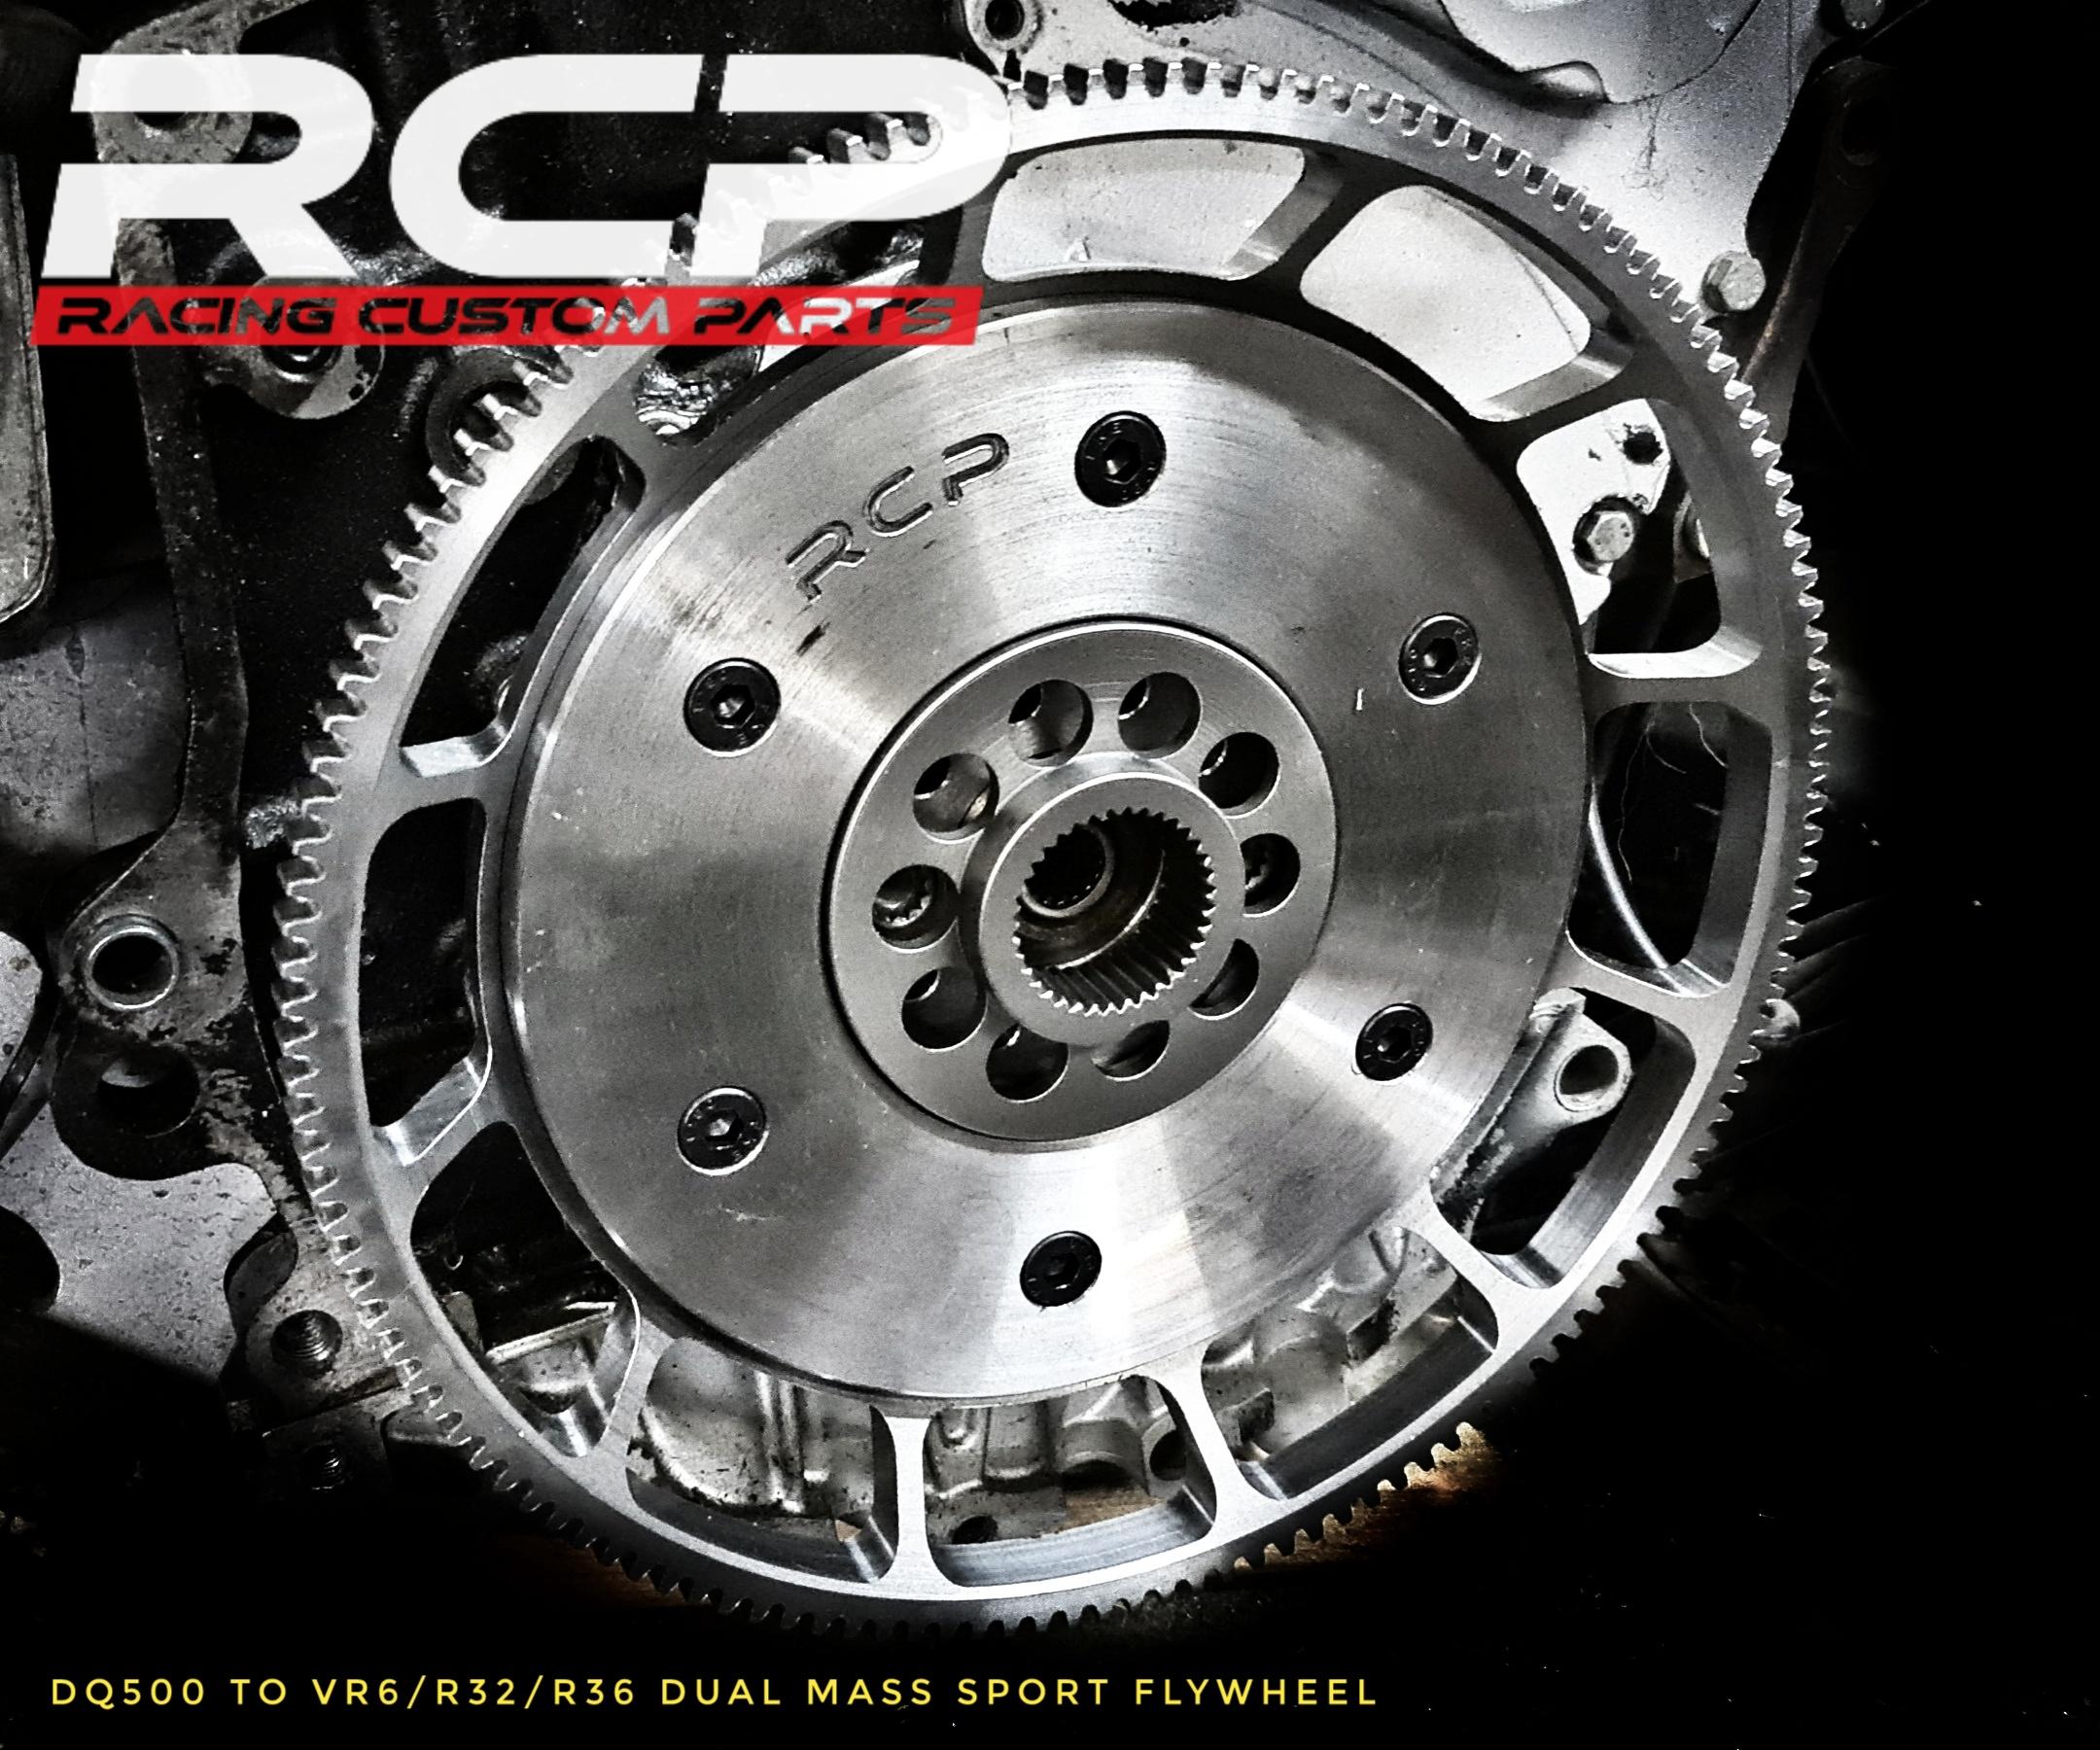 dq500 to r32 vr6 r36 dual mass sport flywheel rcp racing custom parts dragracing fast audi vw turbo dsg gearbox